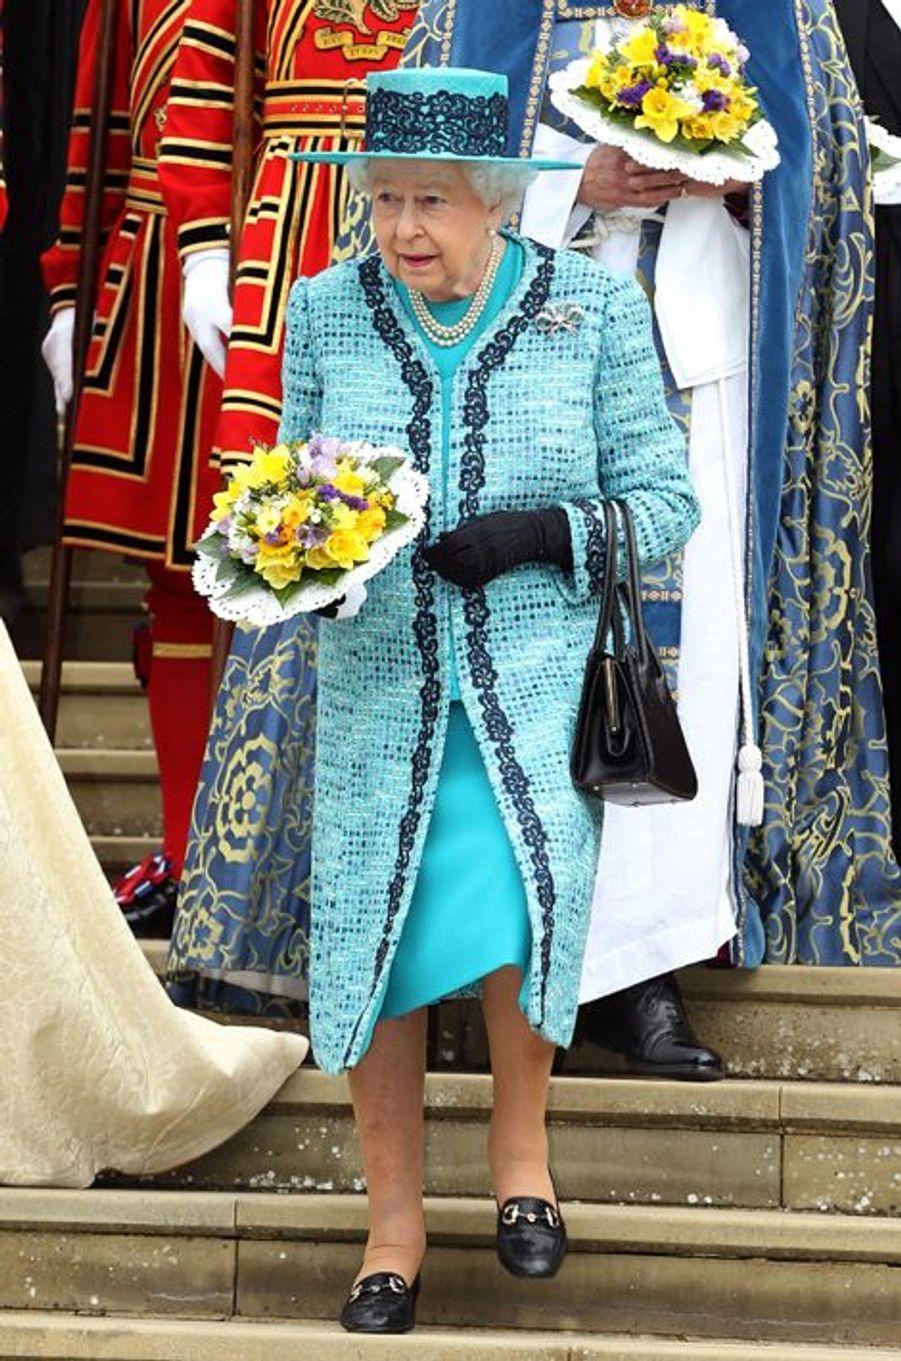 La reine Elizabeth II, le 24 mars 2016